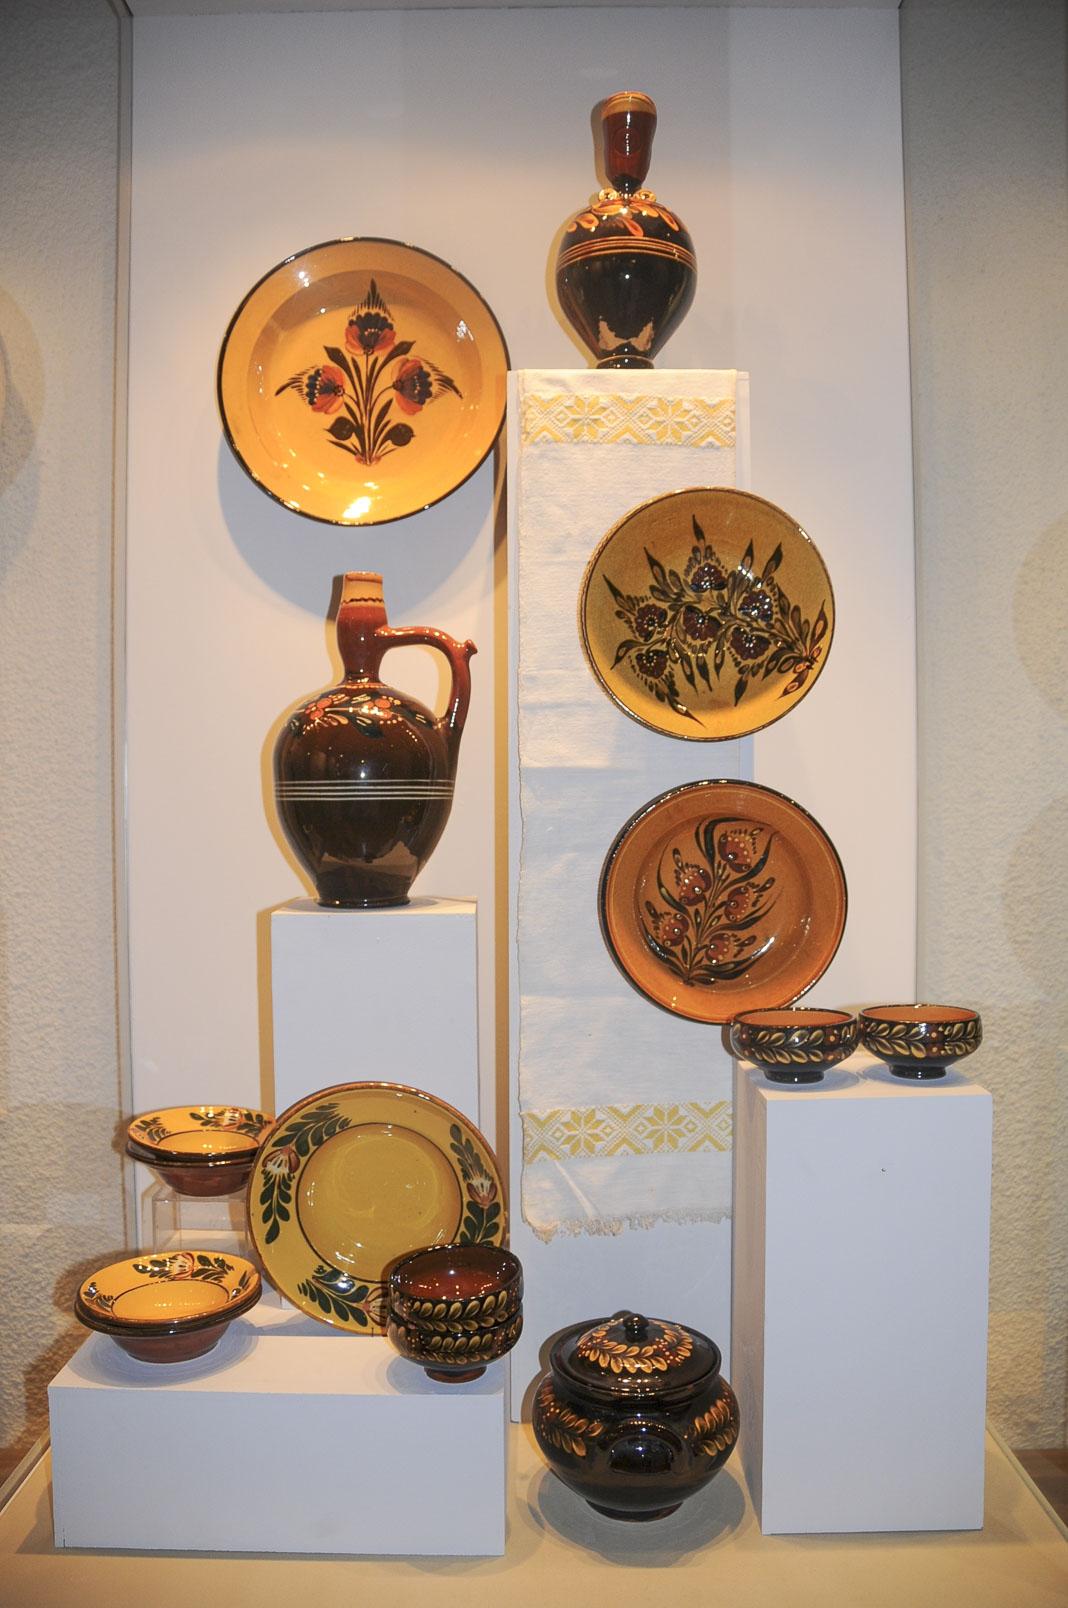 troyan-museum-cvetqta-na-zografa-5